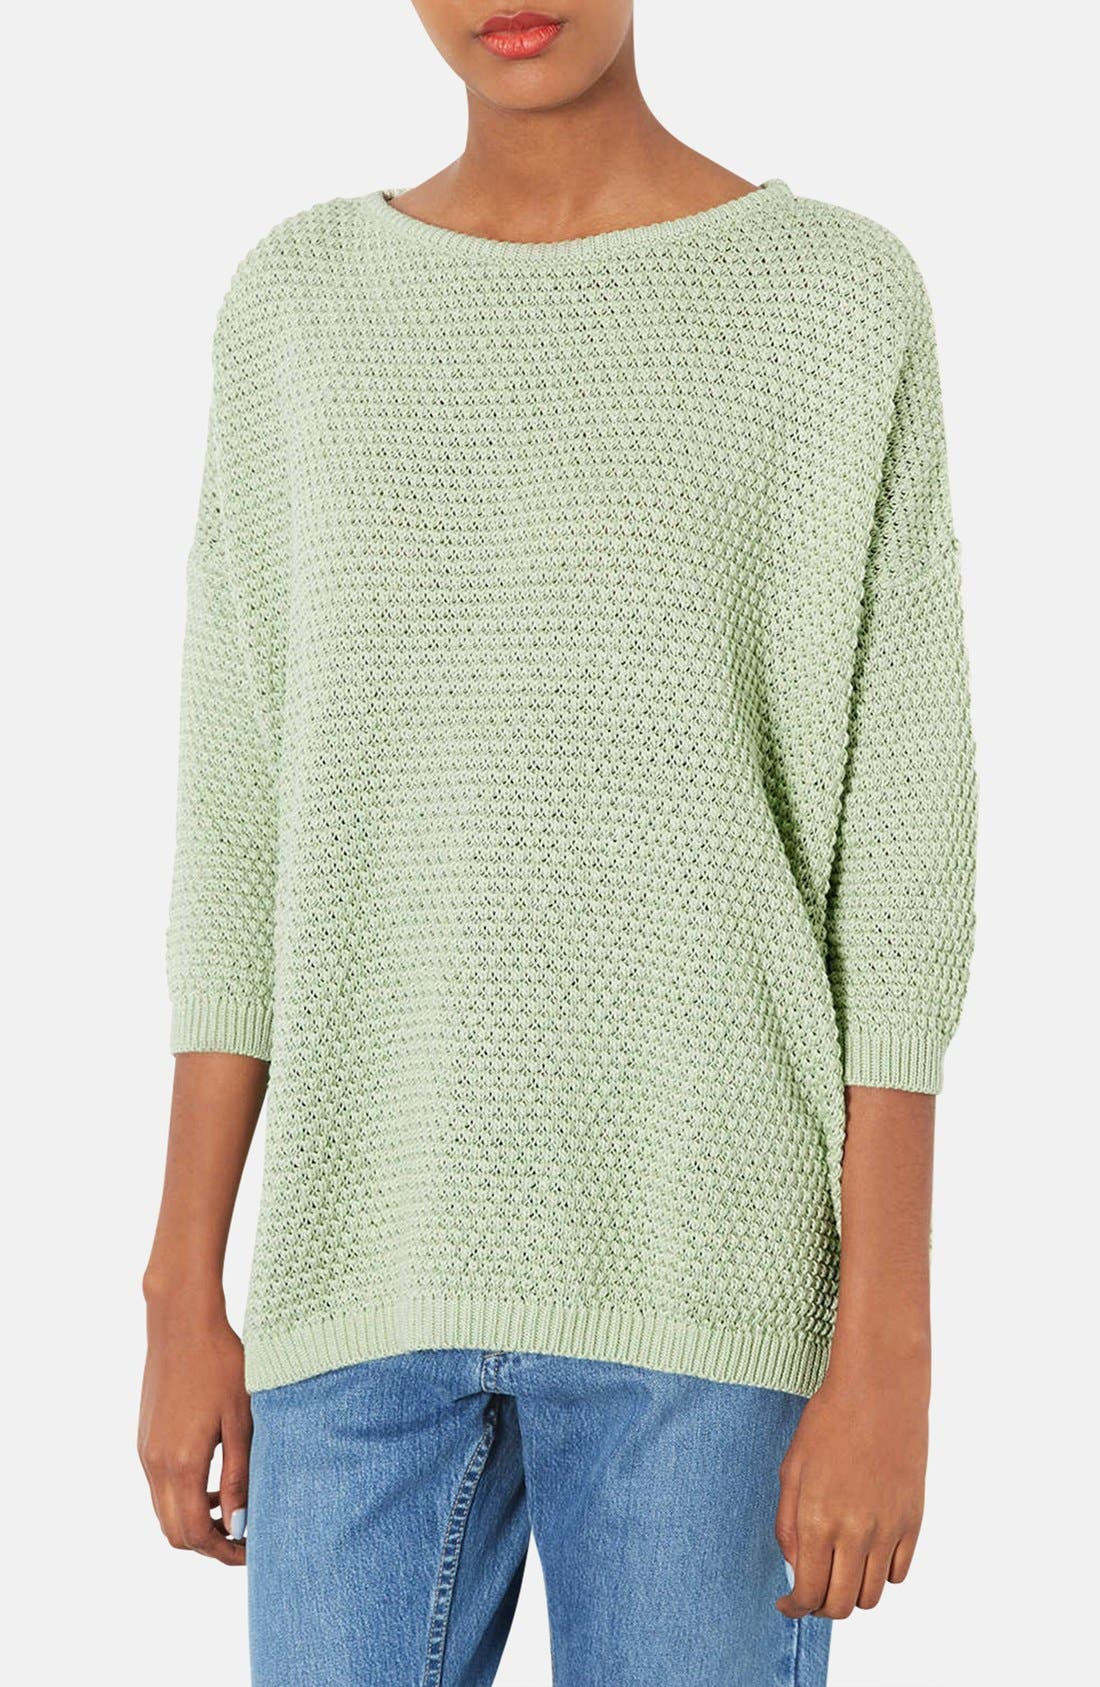 Alternate Image 1 Selected - Topshop Tulip Stitch Sweater